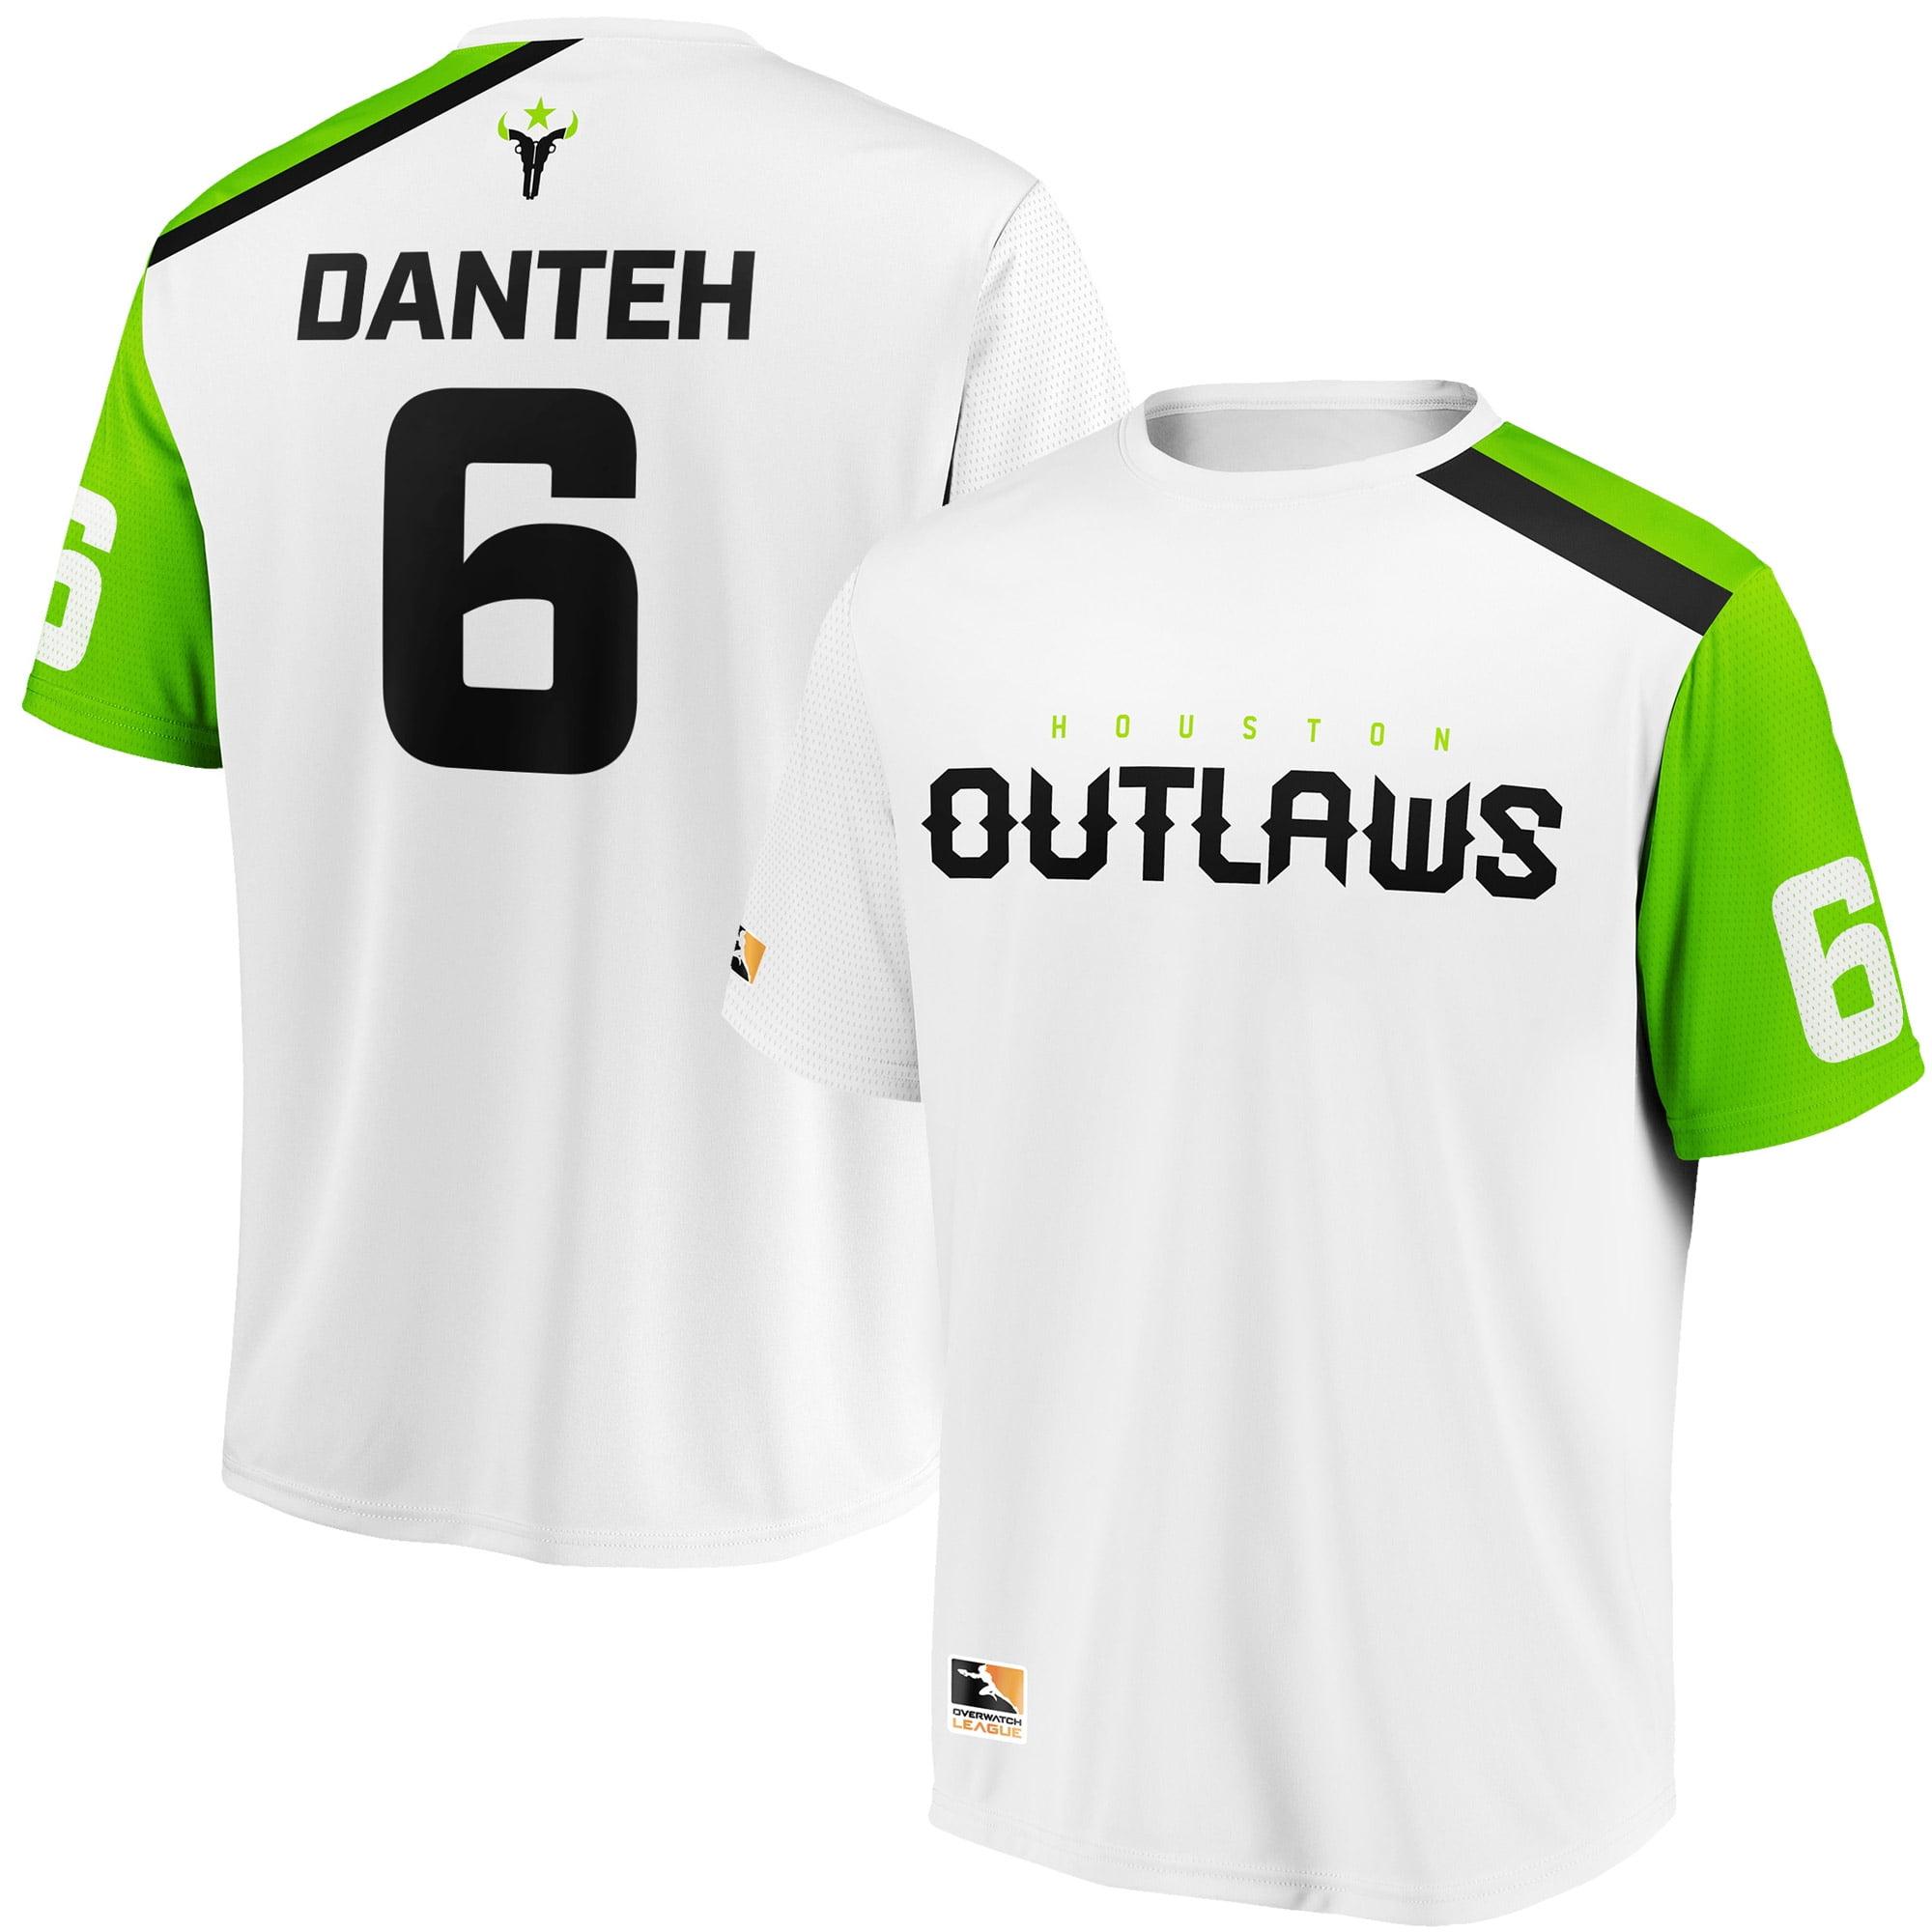 Danteh Houston Outlaws Overwatch League Replica Away Jersey - White